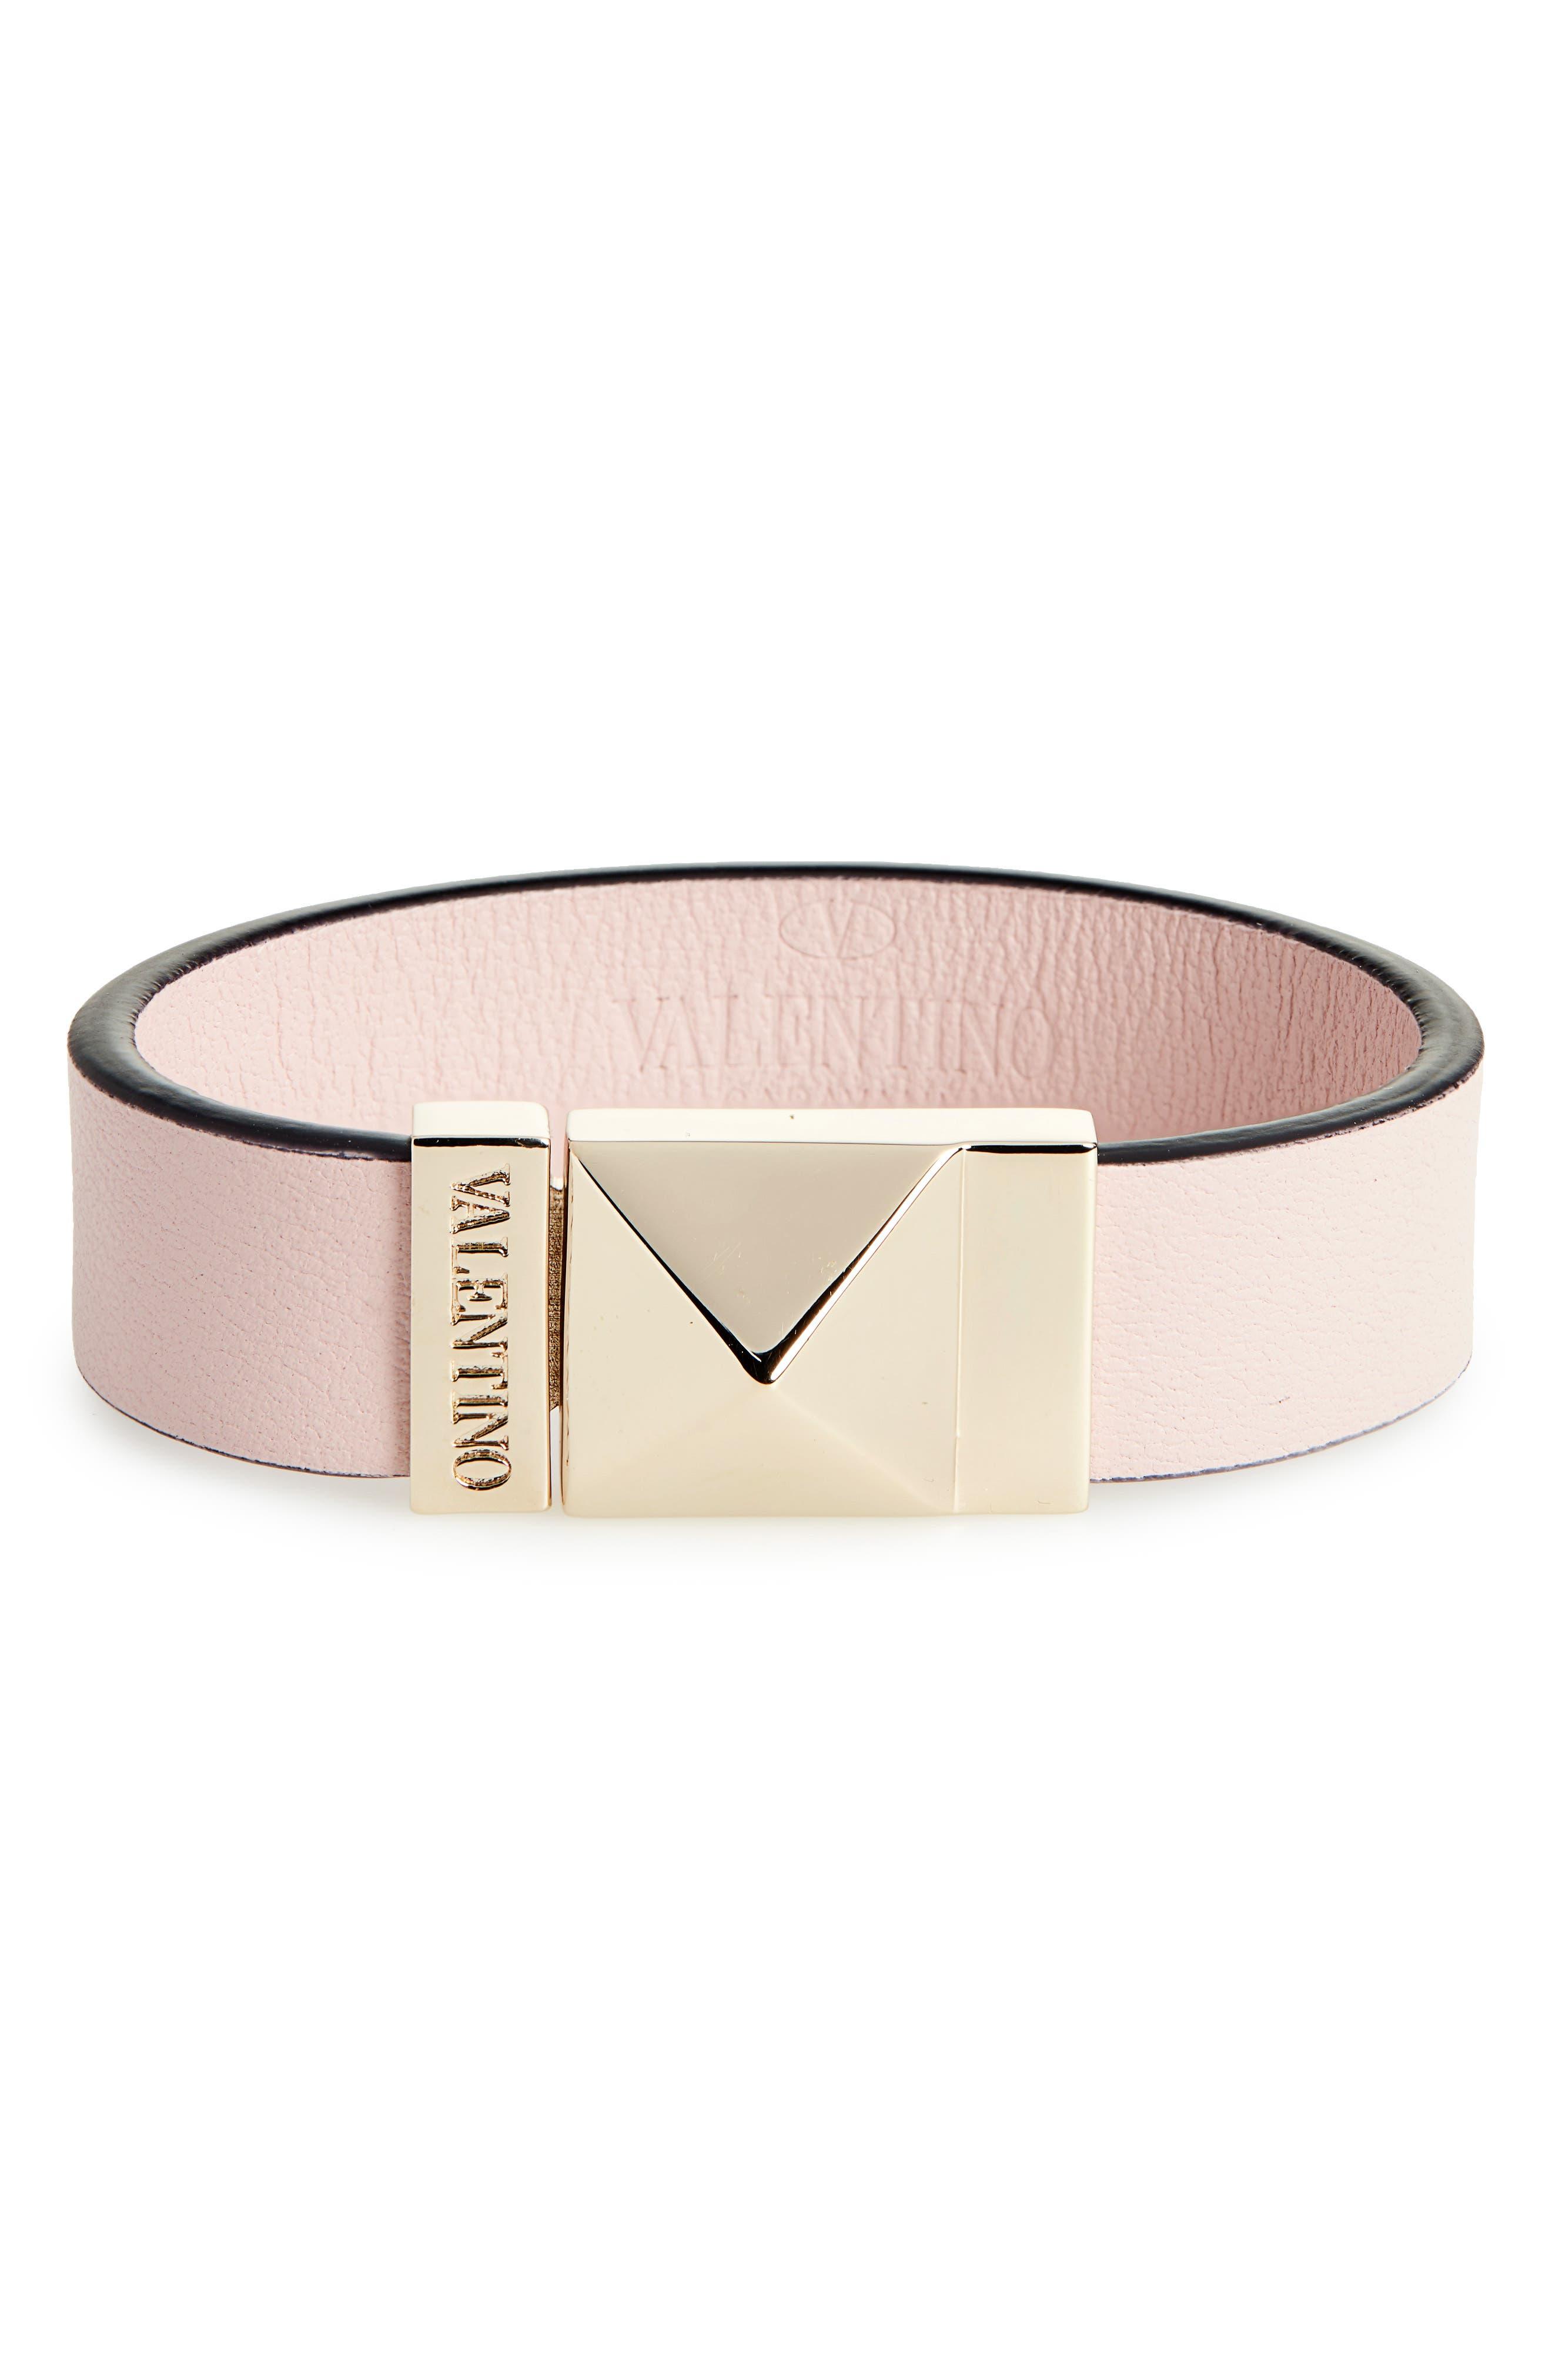 07d5f0cba109 Bracelets Valentino Sunglasses